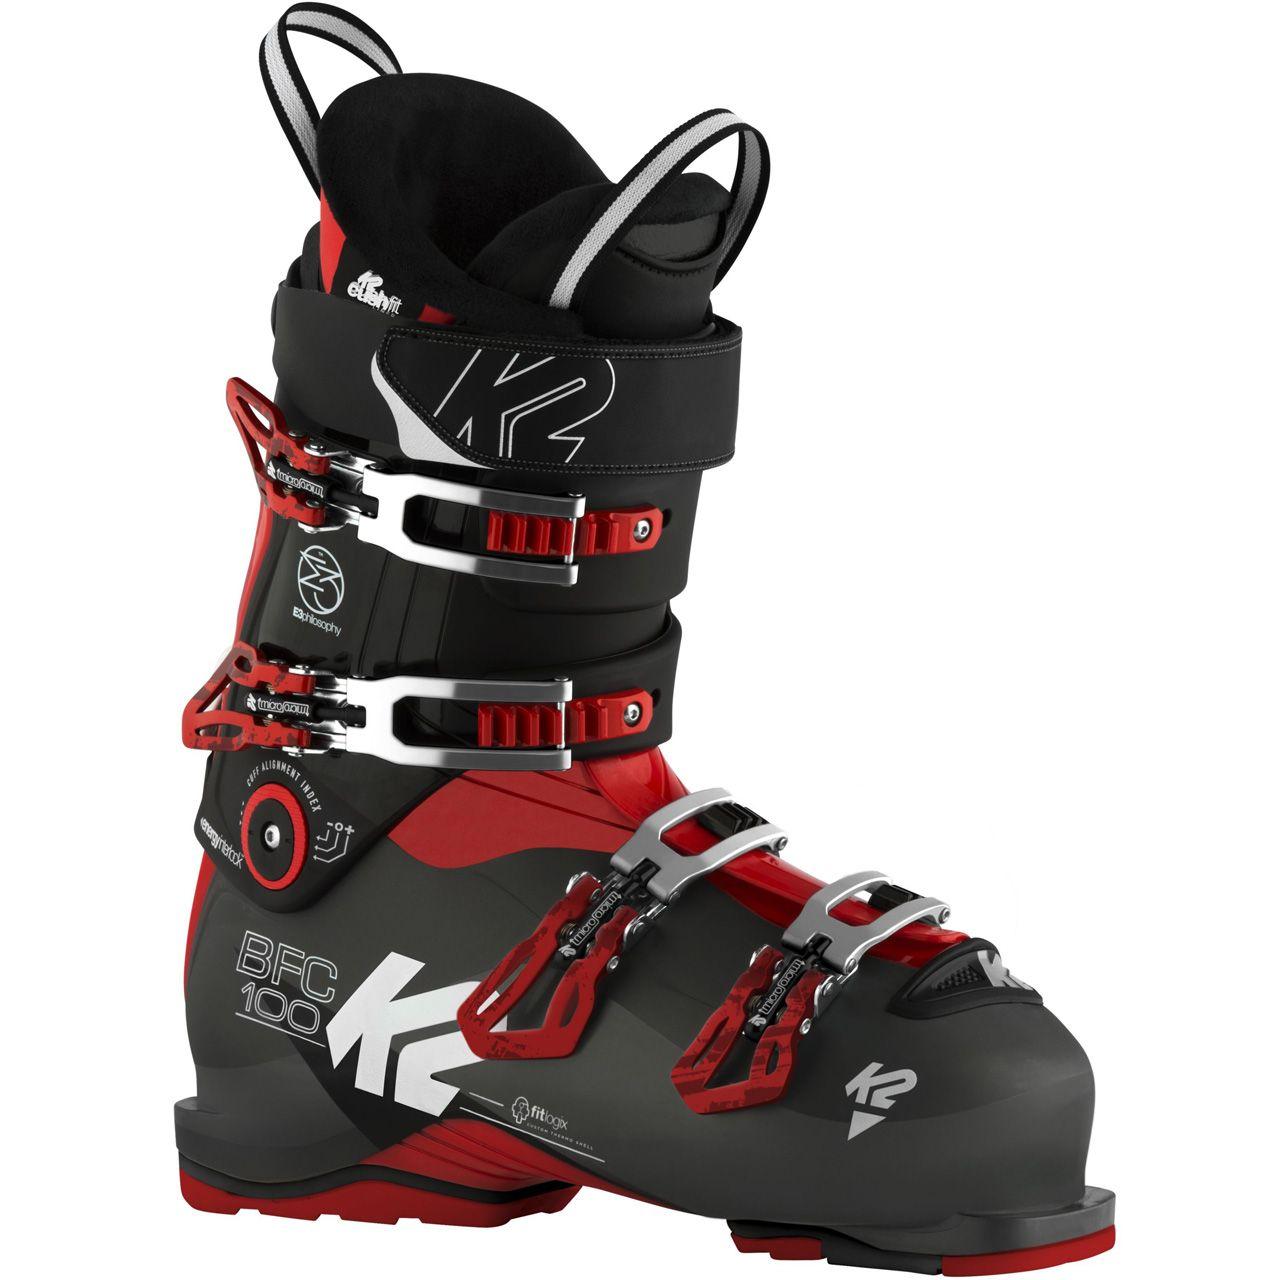 K2 B F C 90 HV Ski Boot 103mm Grosse 275